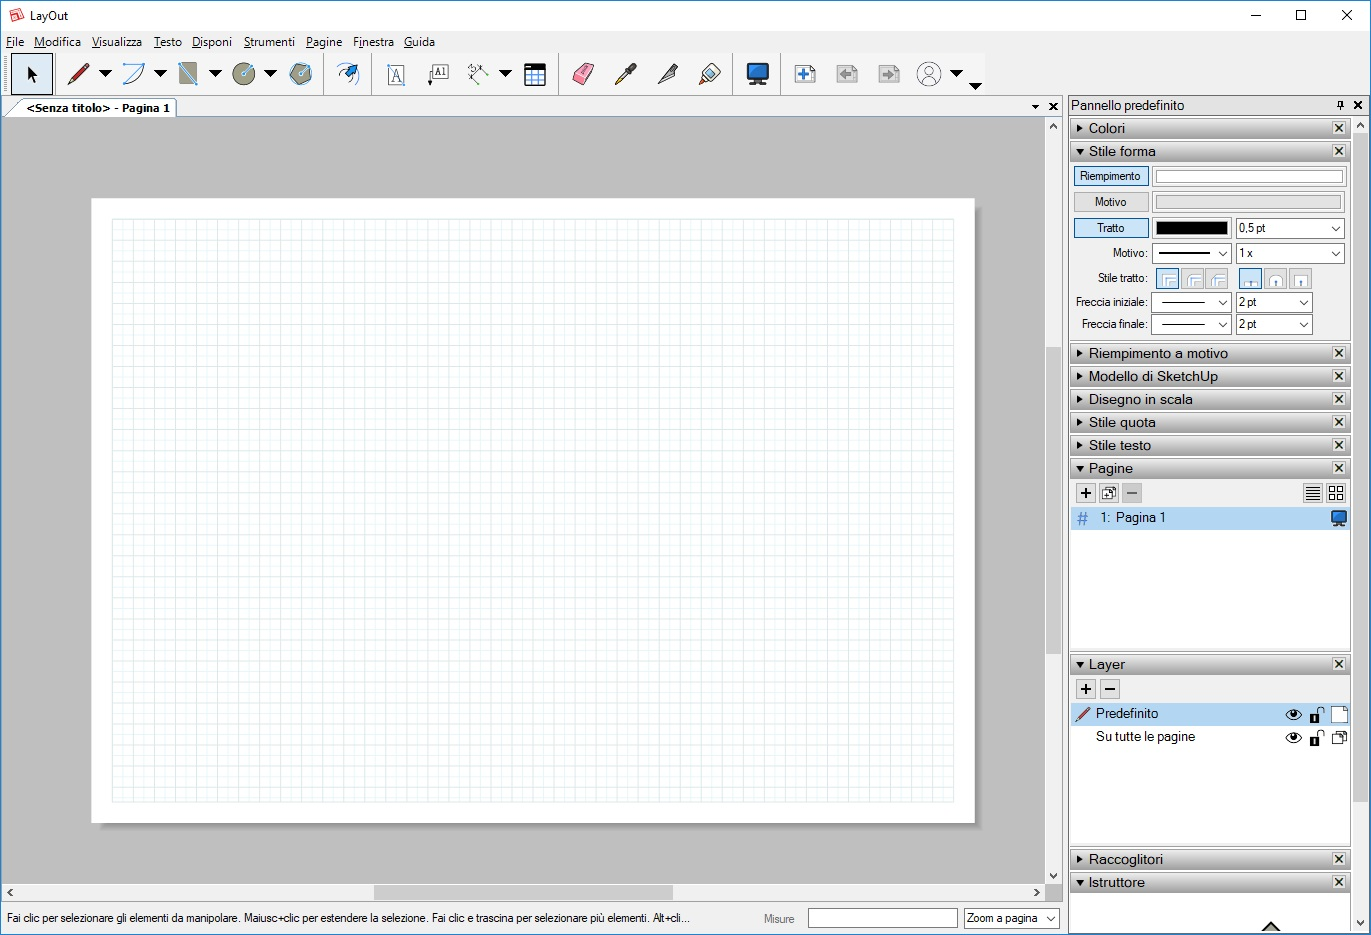 SketchUp Pro 2020 v20.0.373 64 Bit - ITA